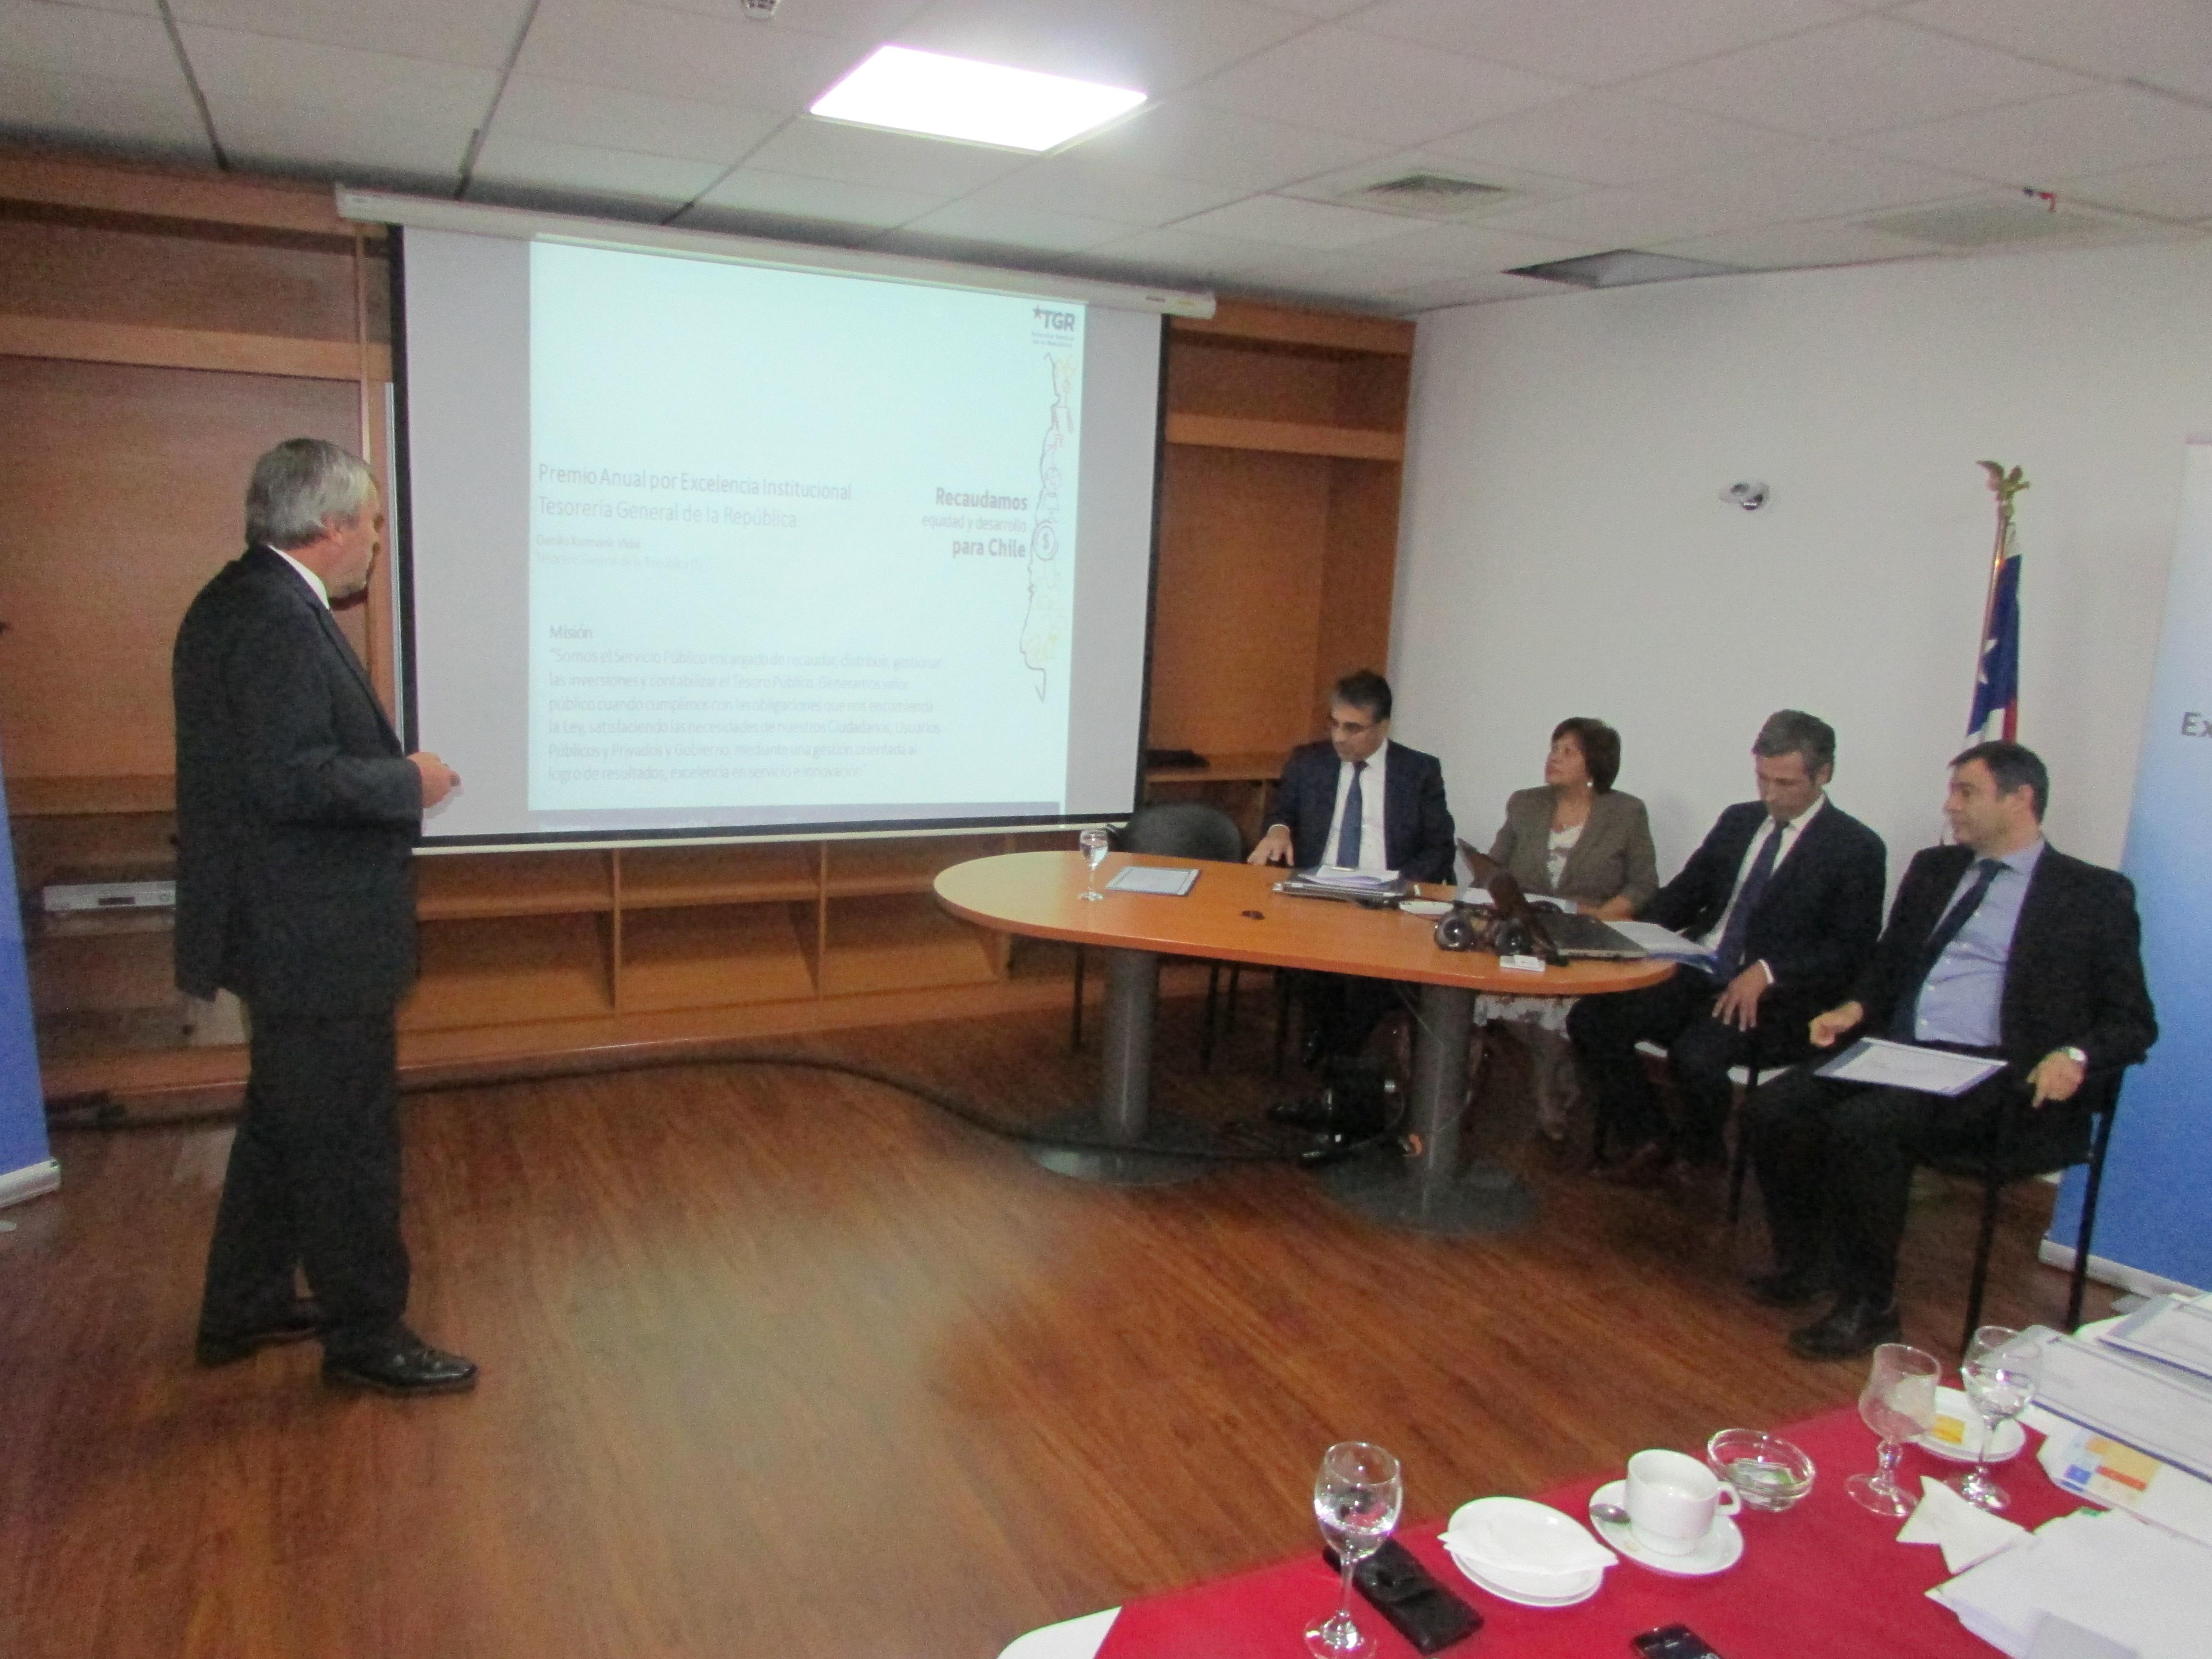 AET participa en presentación por Premio Anual por Excelencia Institucional 2017